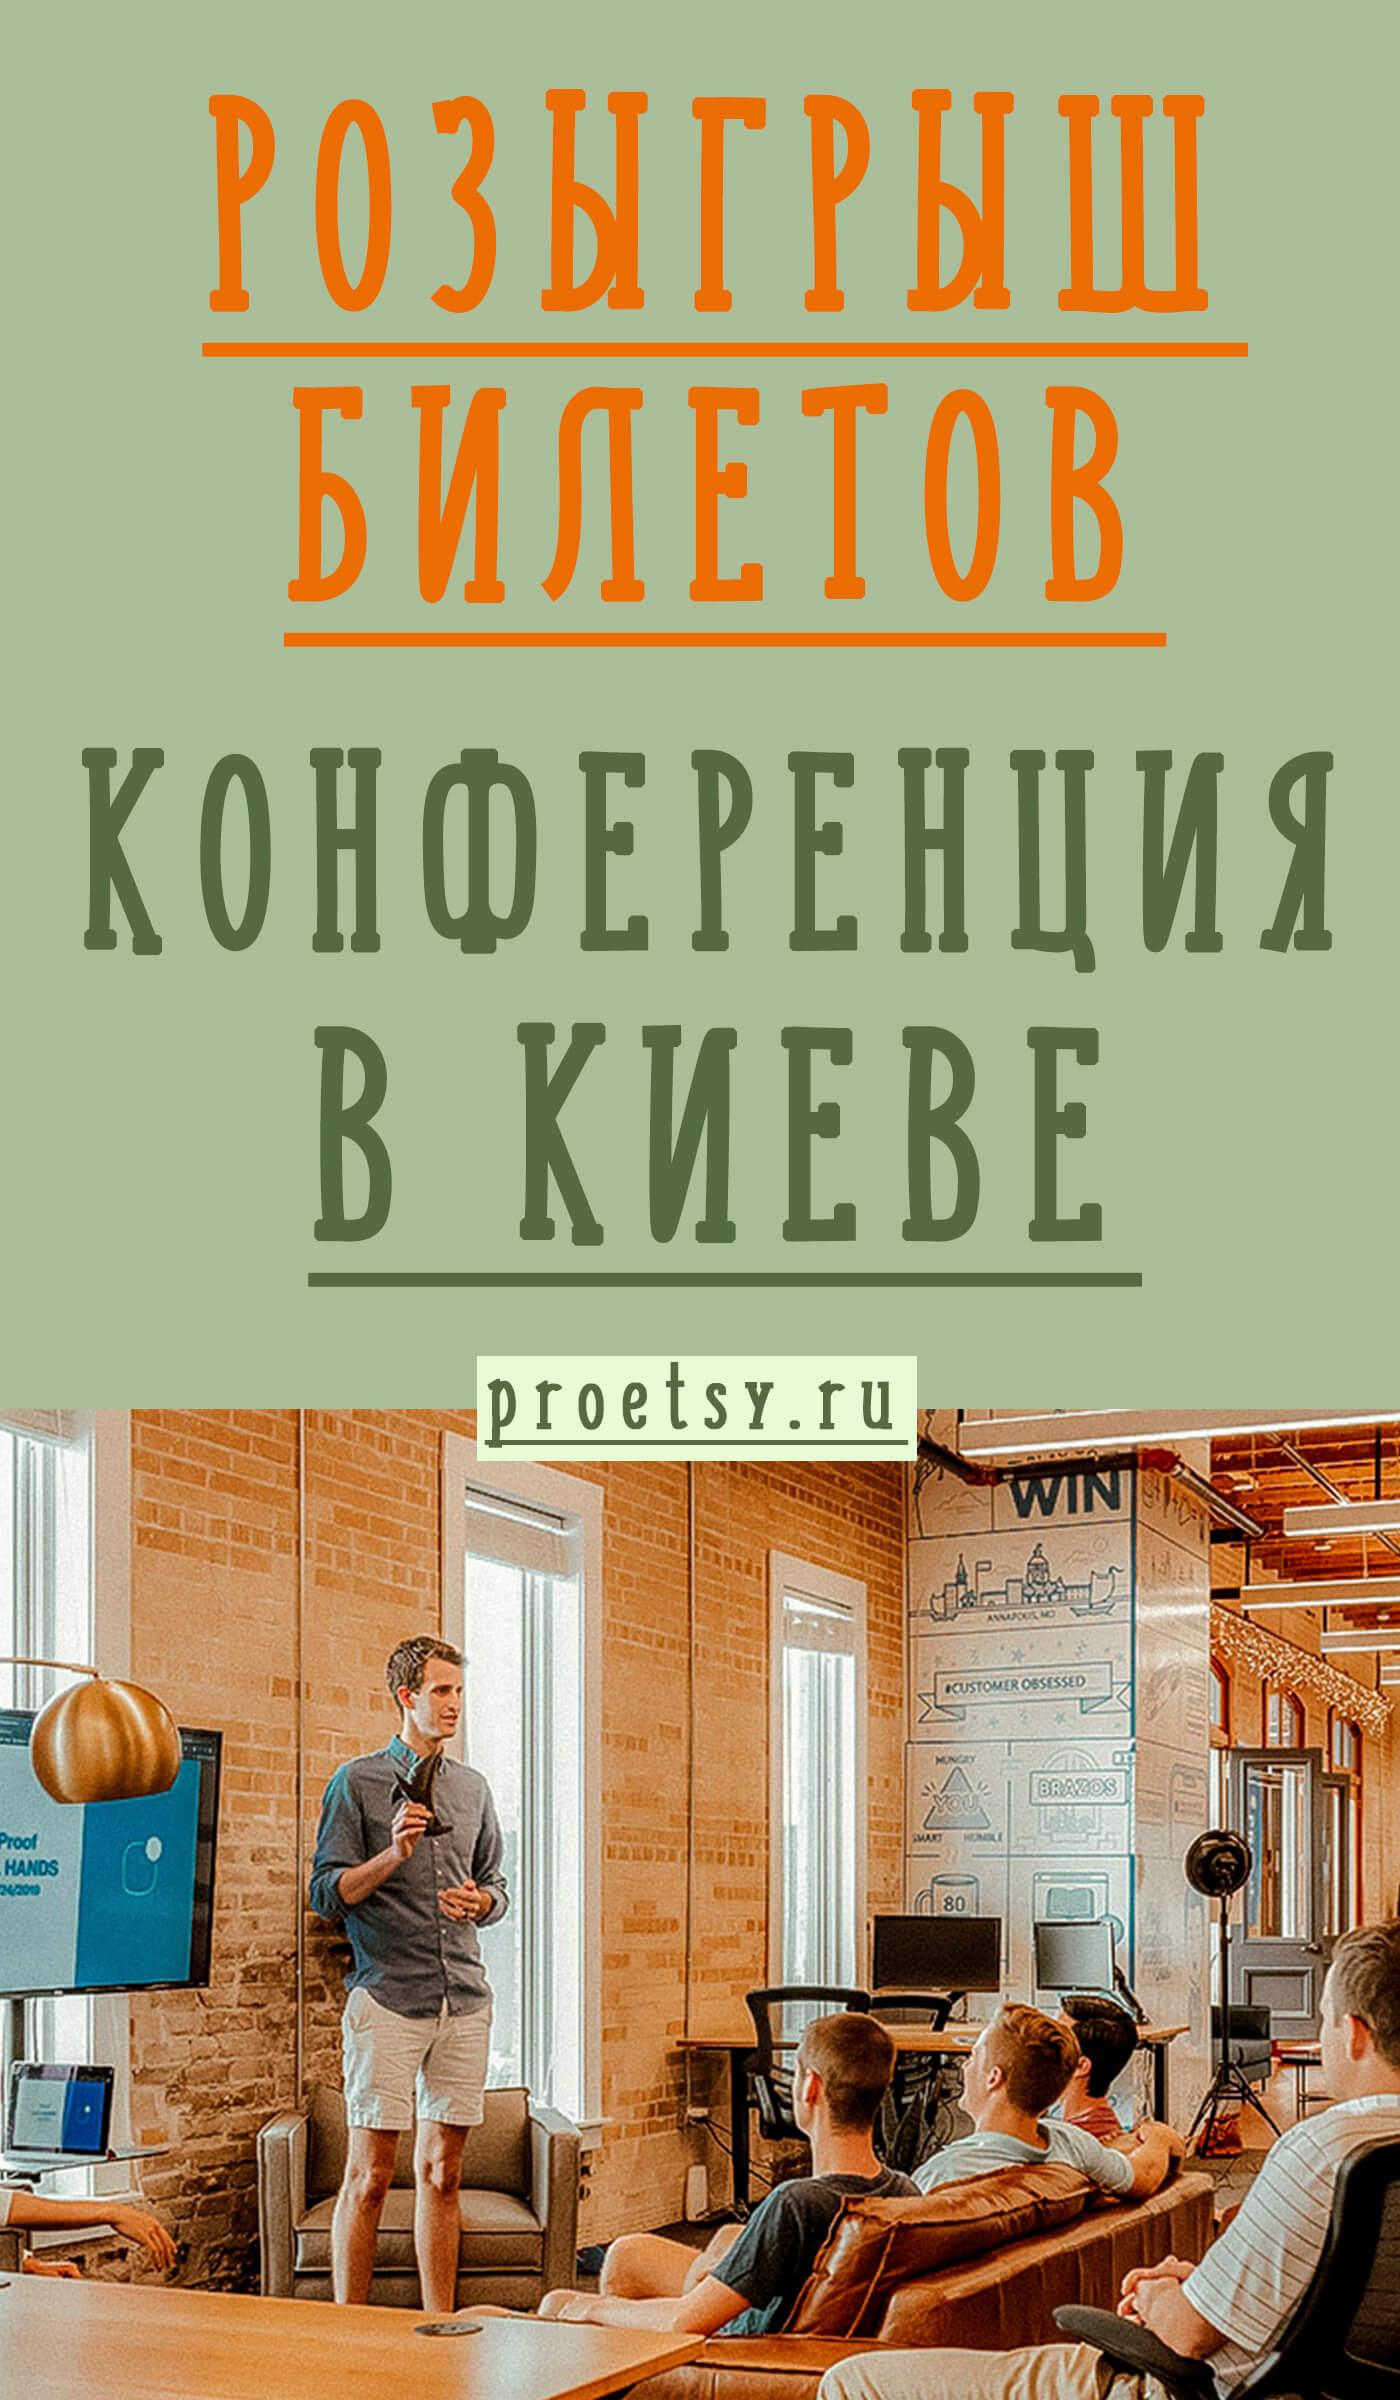 Киев бизнес-семинар Этси Проэтси 5 октября